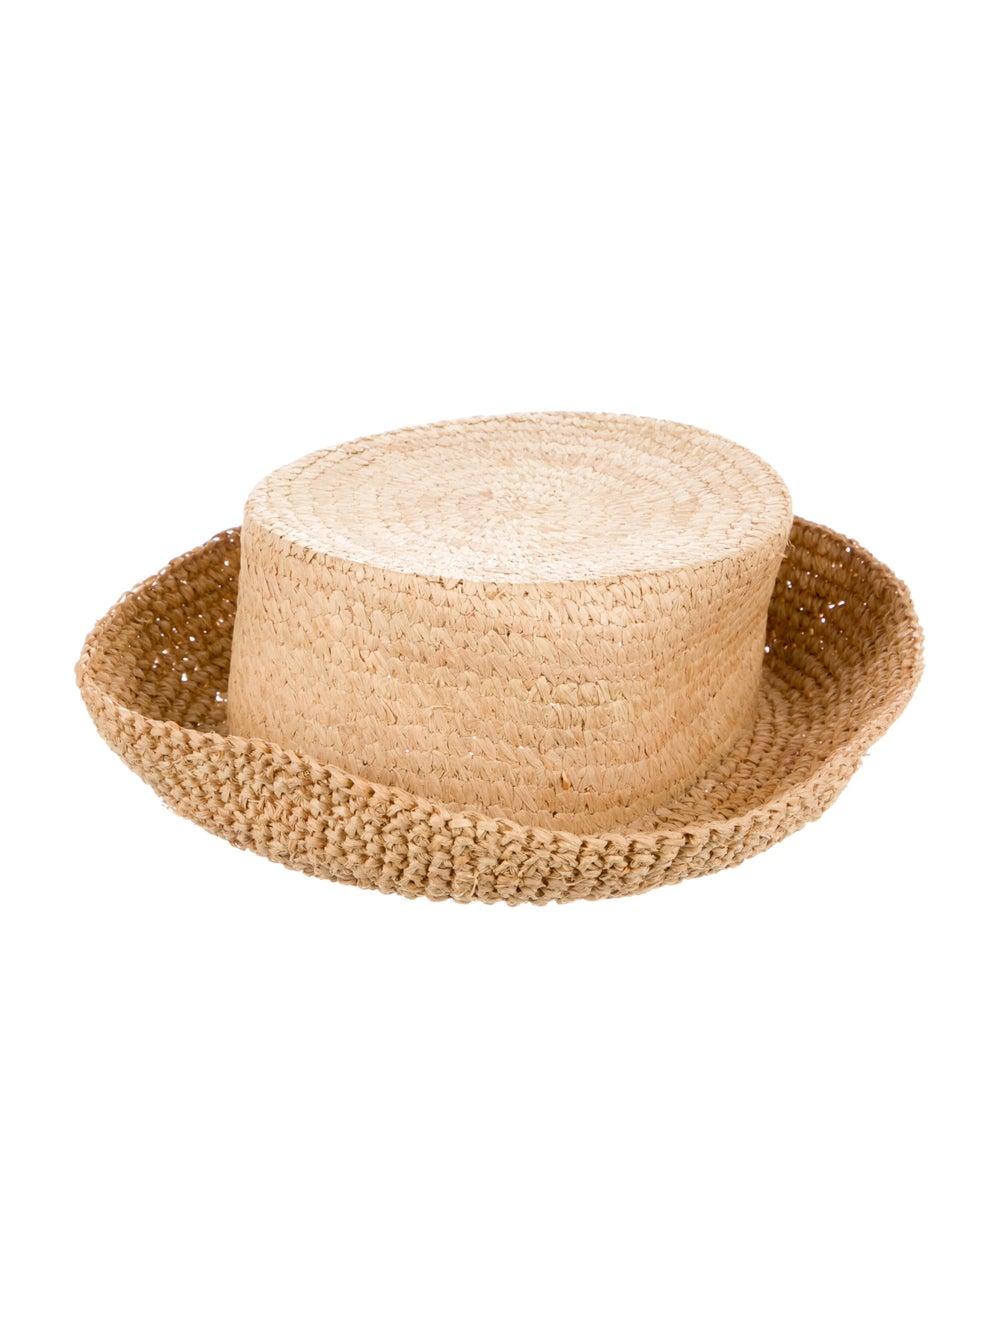 Janessa Leone Yellow Straw Hat yellow - image 2